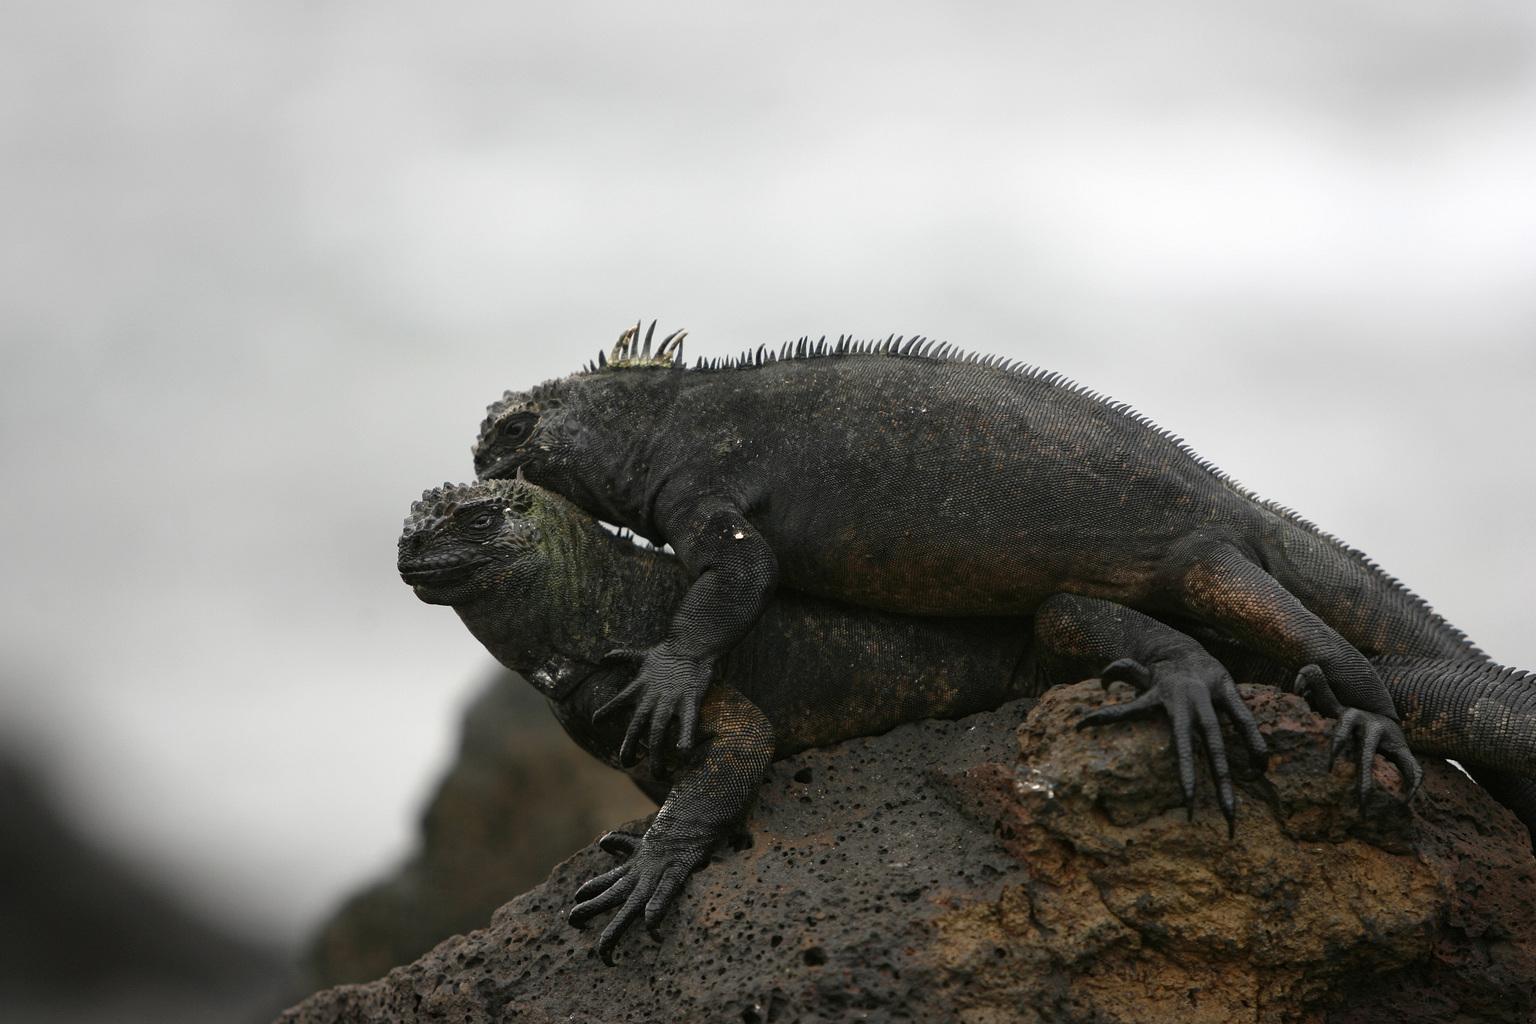 Tengeri leguánok a Santa Cruz-szigeten. (Fotó: Reuters/Guillermo Granja)